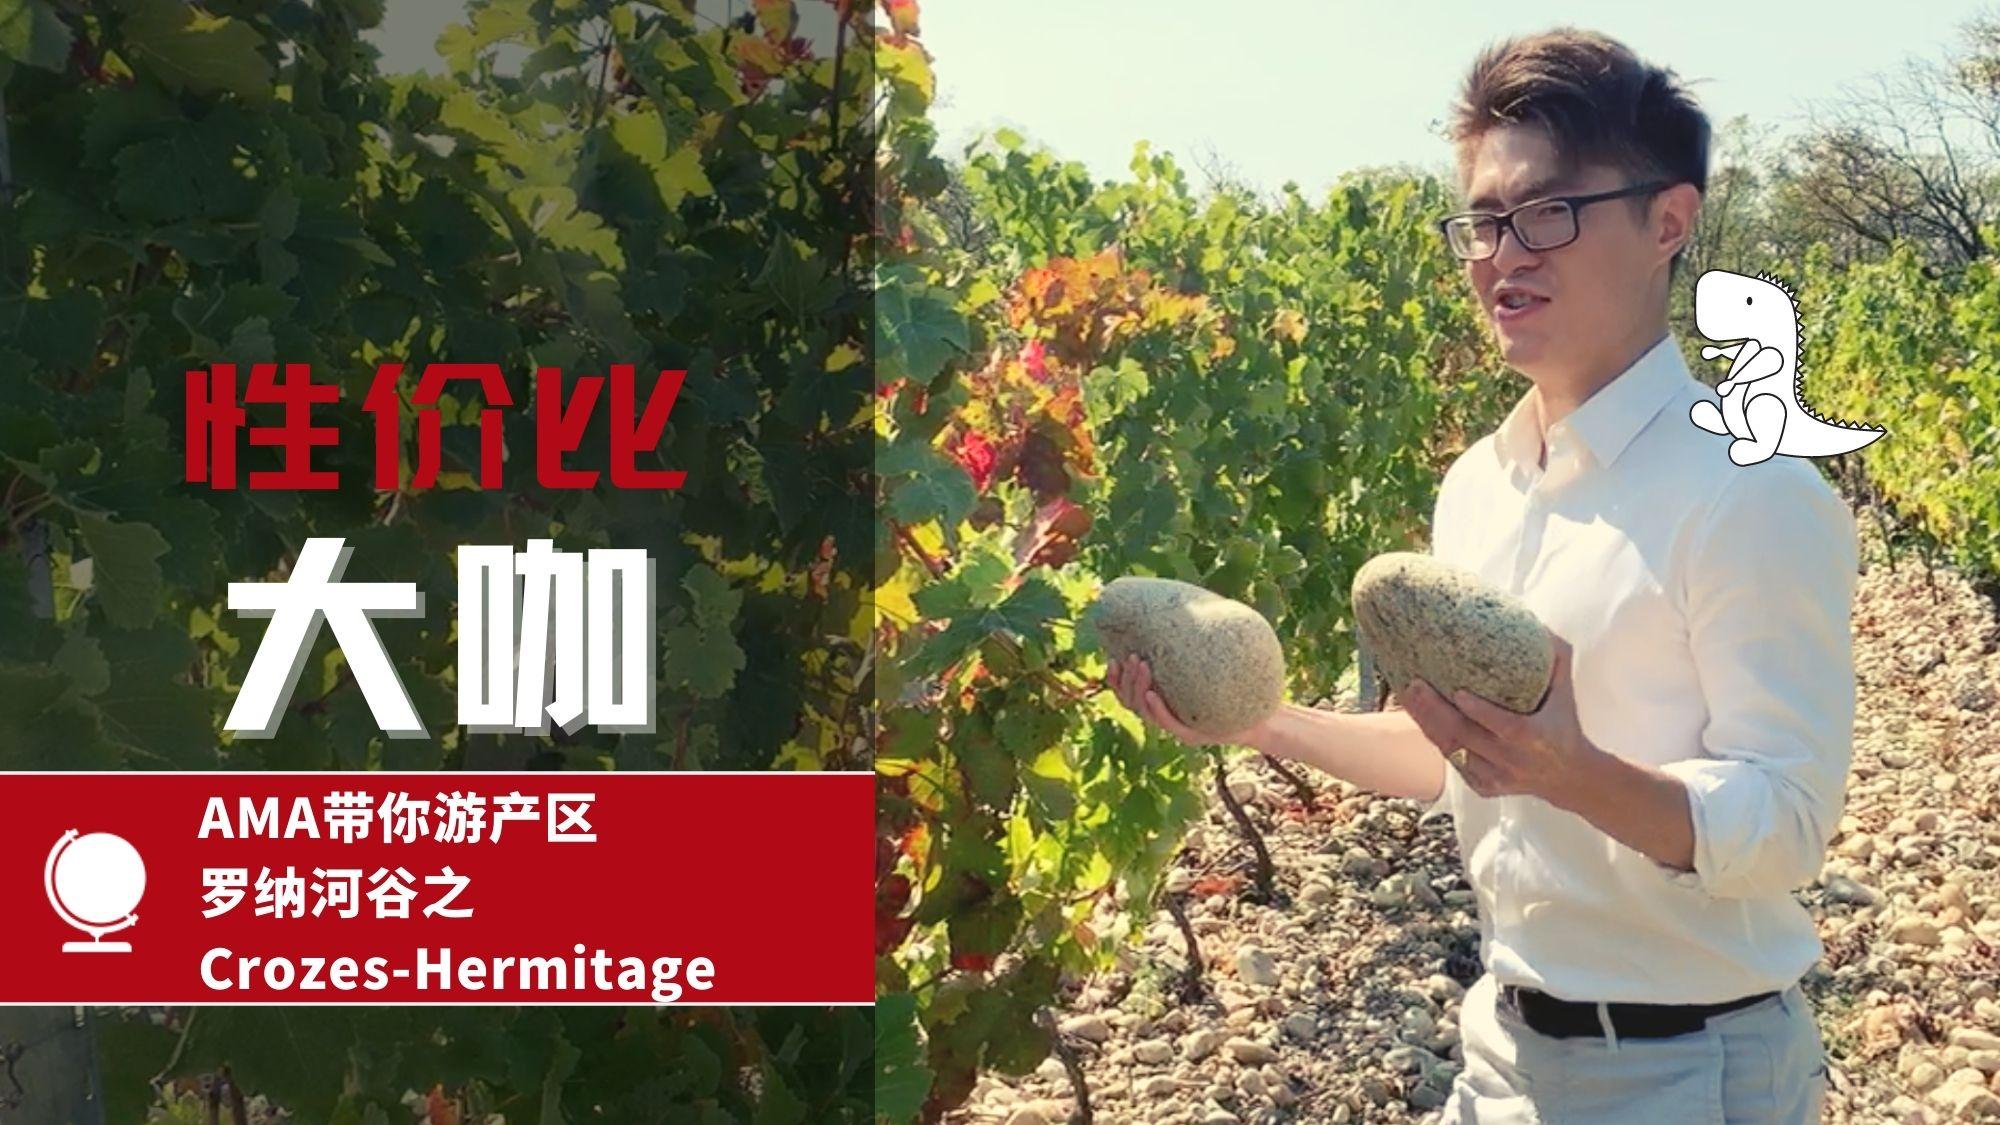 AMA Wine Study Tour – Crozes-Hermitage, Rhone Valley - Alexandre MA